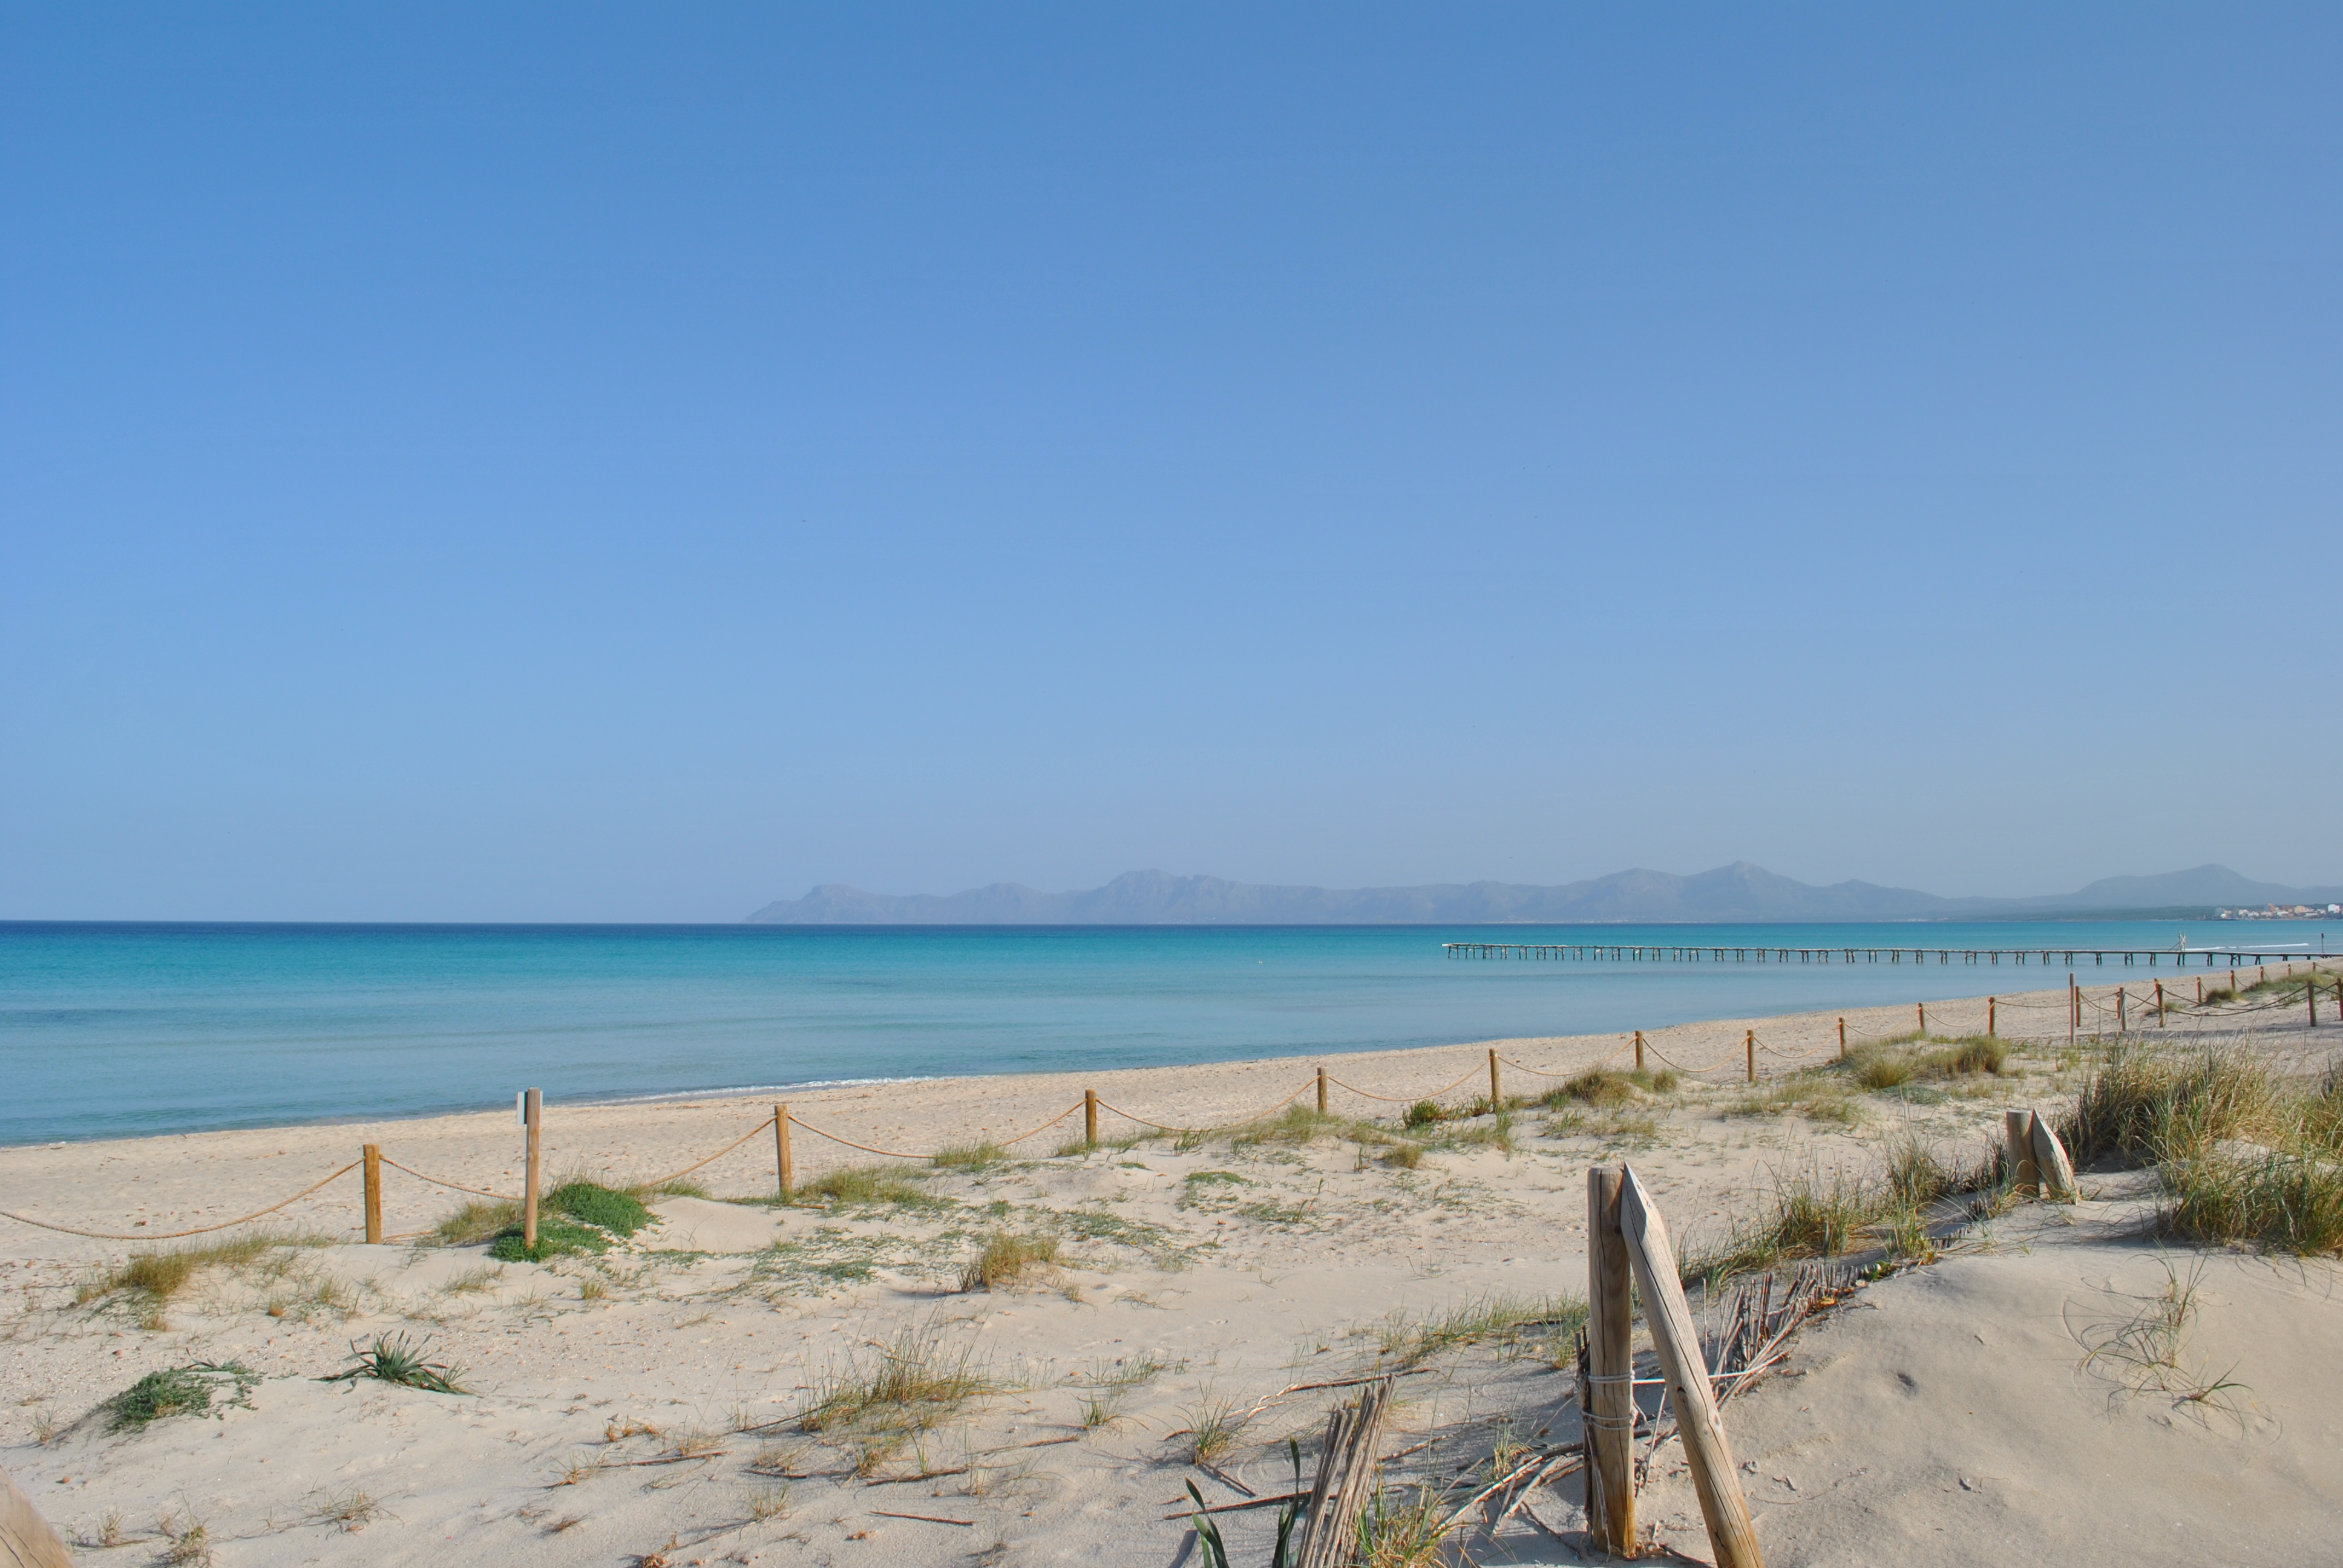 File:Playa de Muro.JPG - Wikimedia Commons